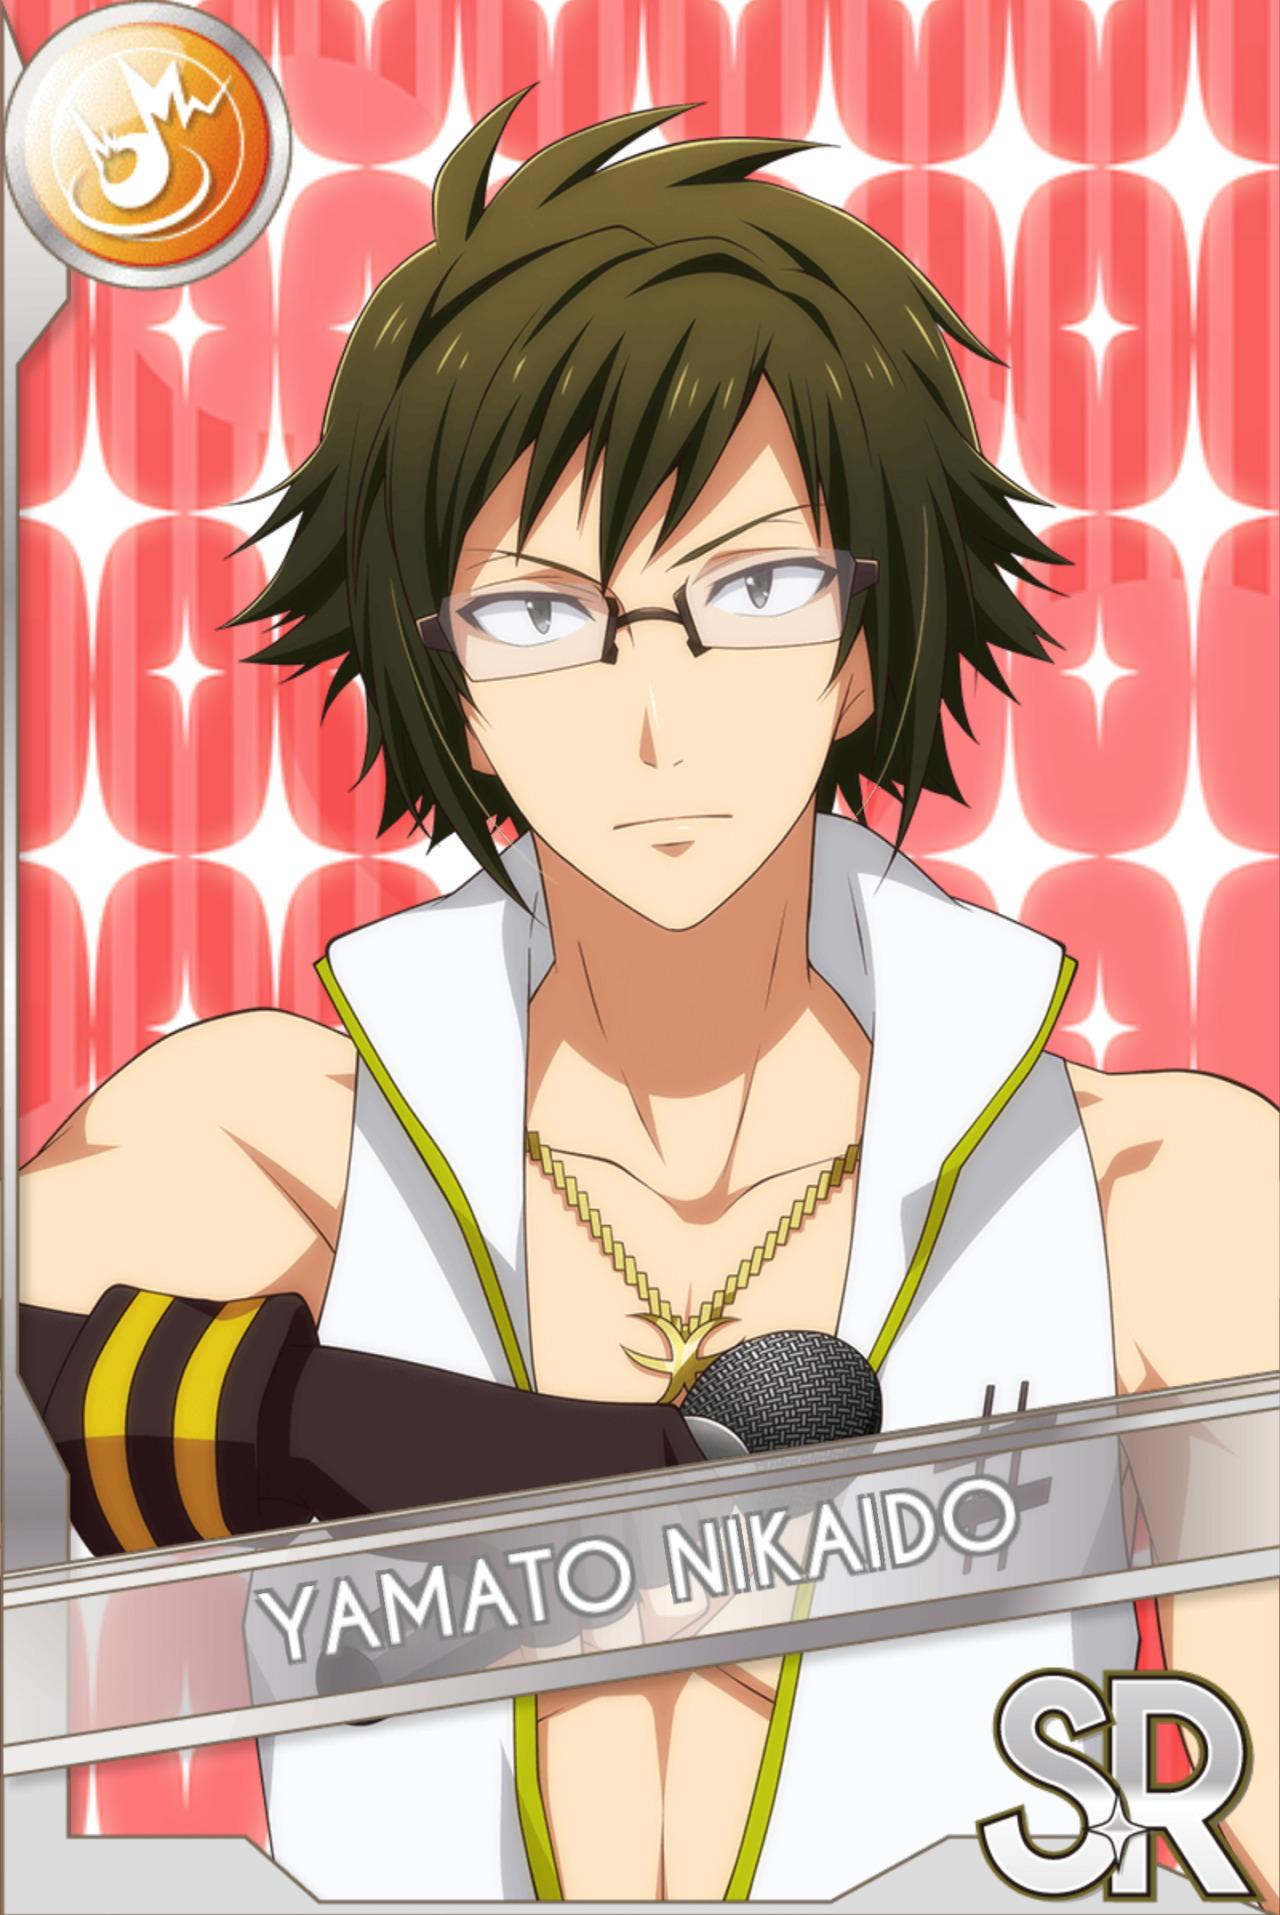 File:Yamato Nikaido (End-of-Year Live).png